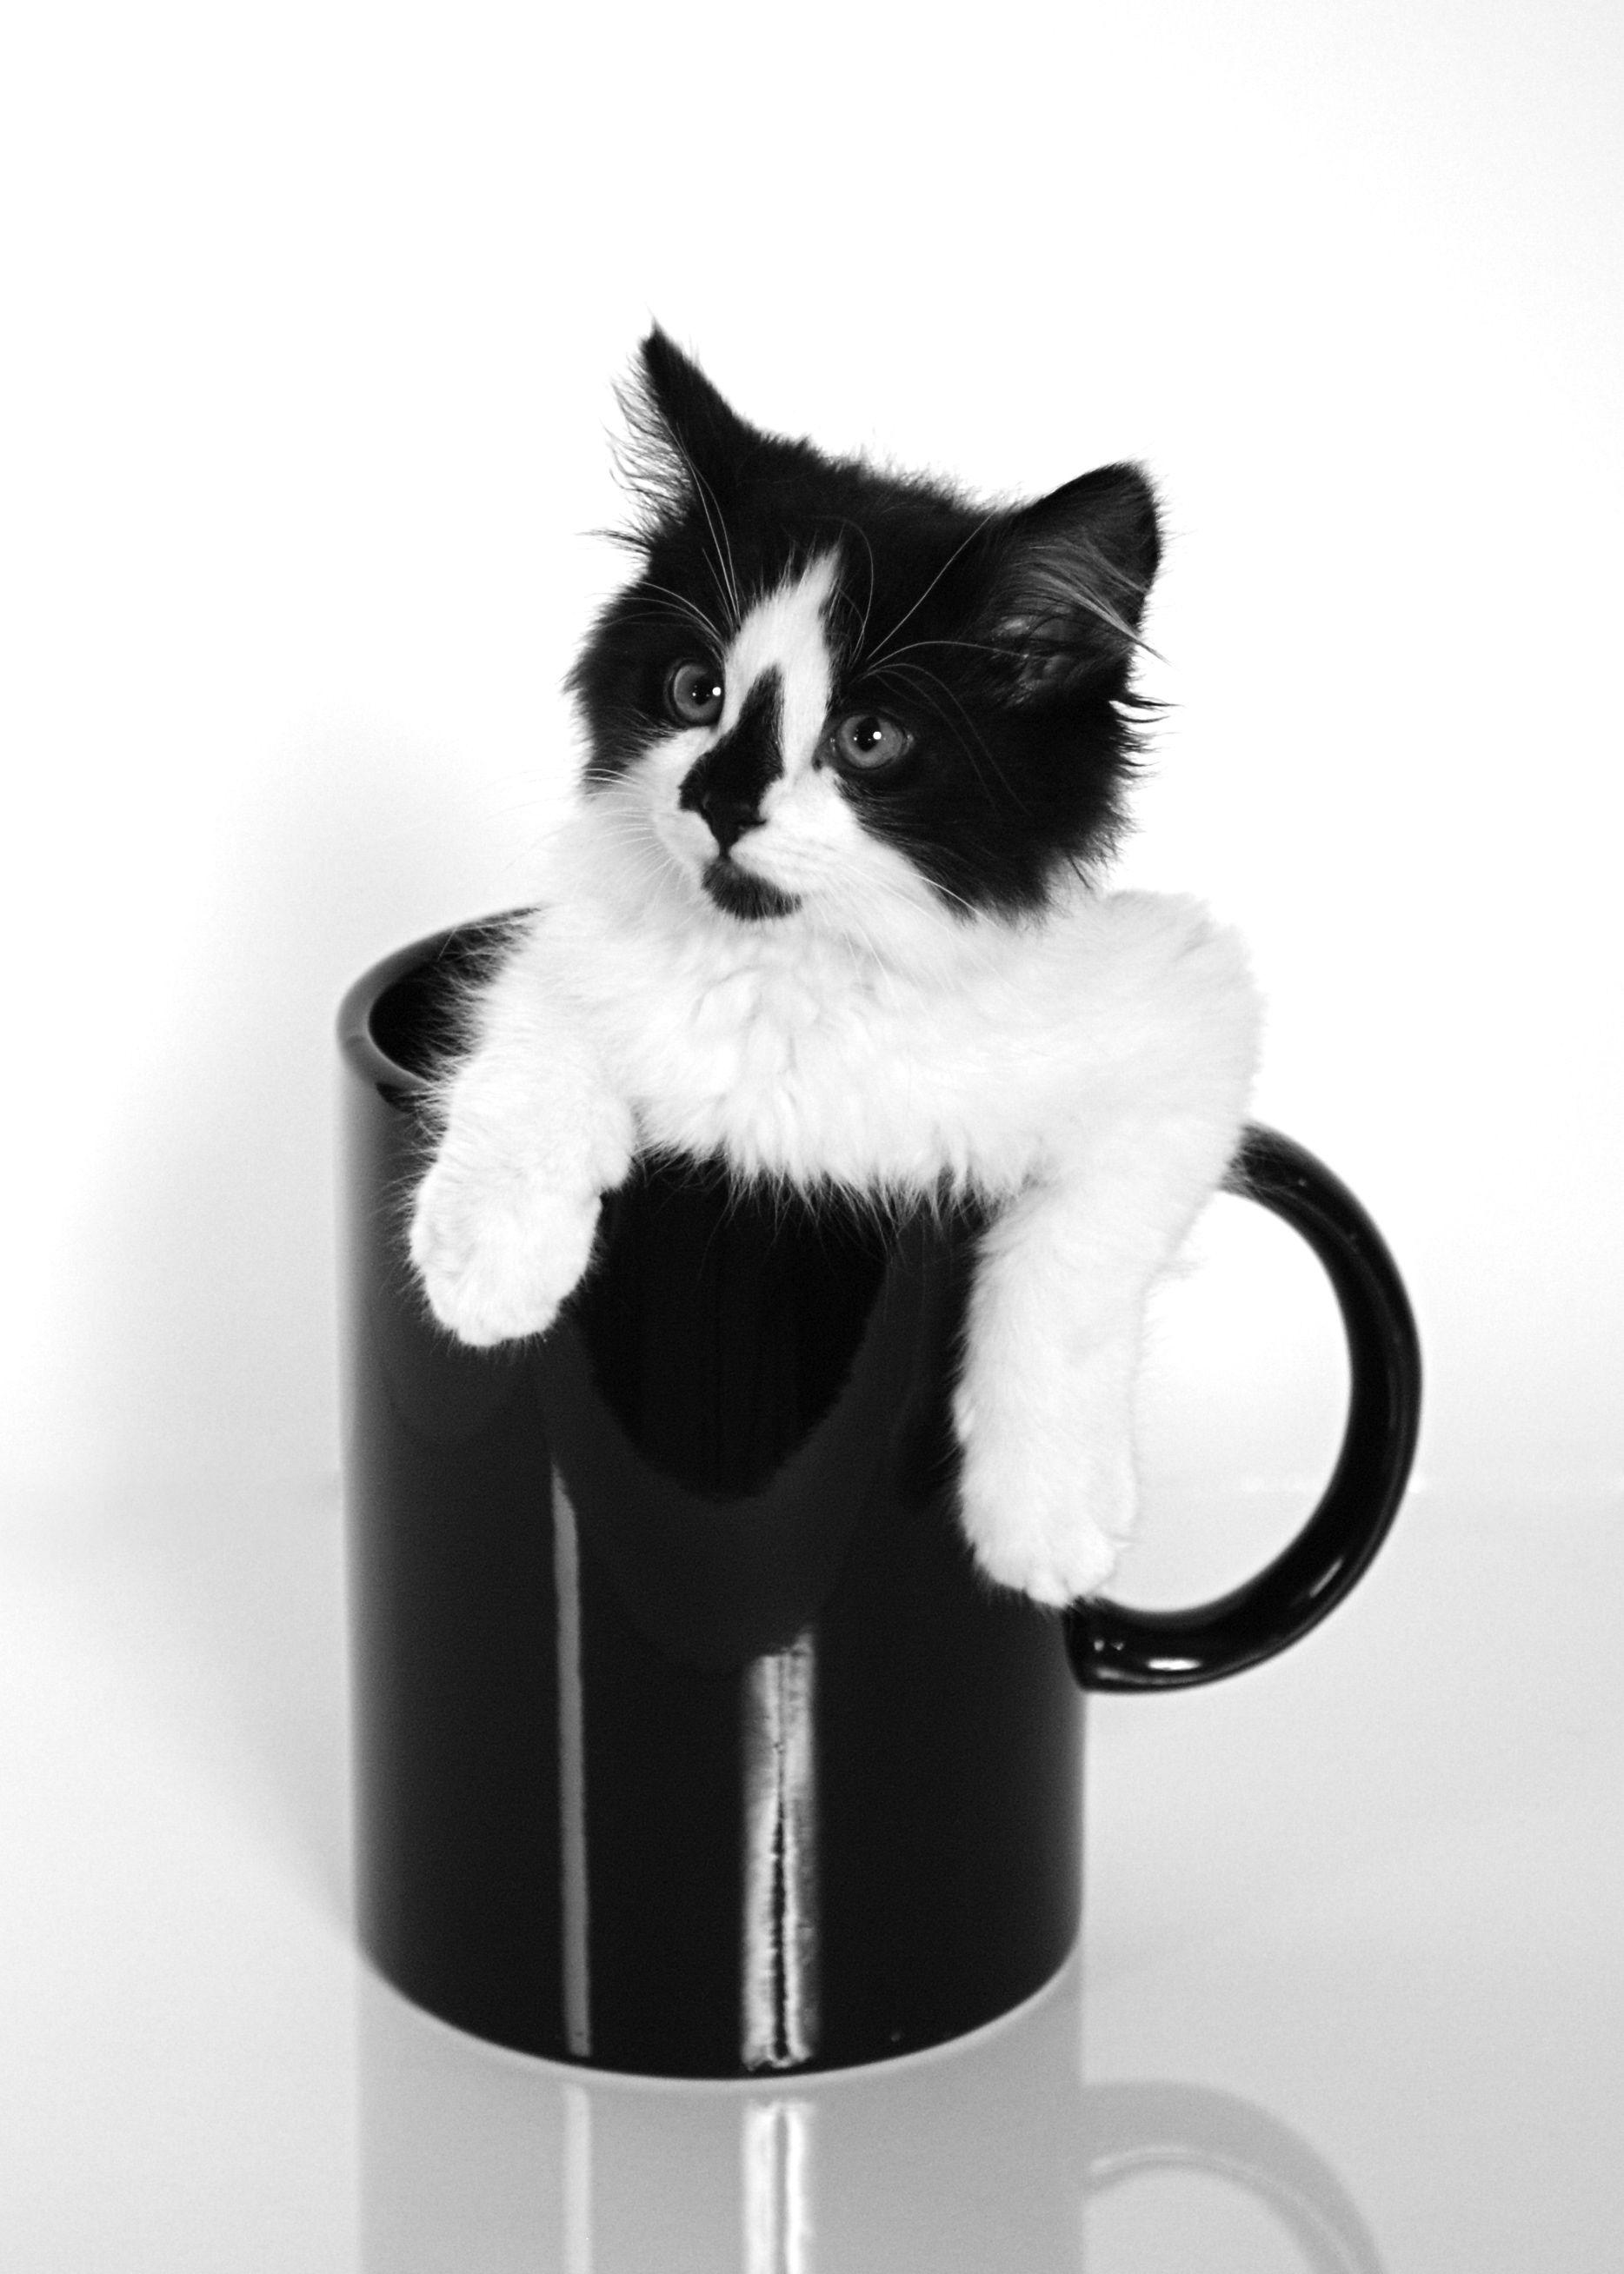 A cute kitten sitting in a cup 😍☕️🐱 kitten cute cat